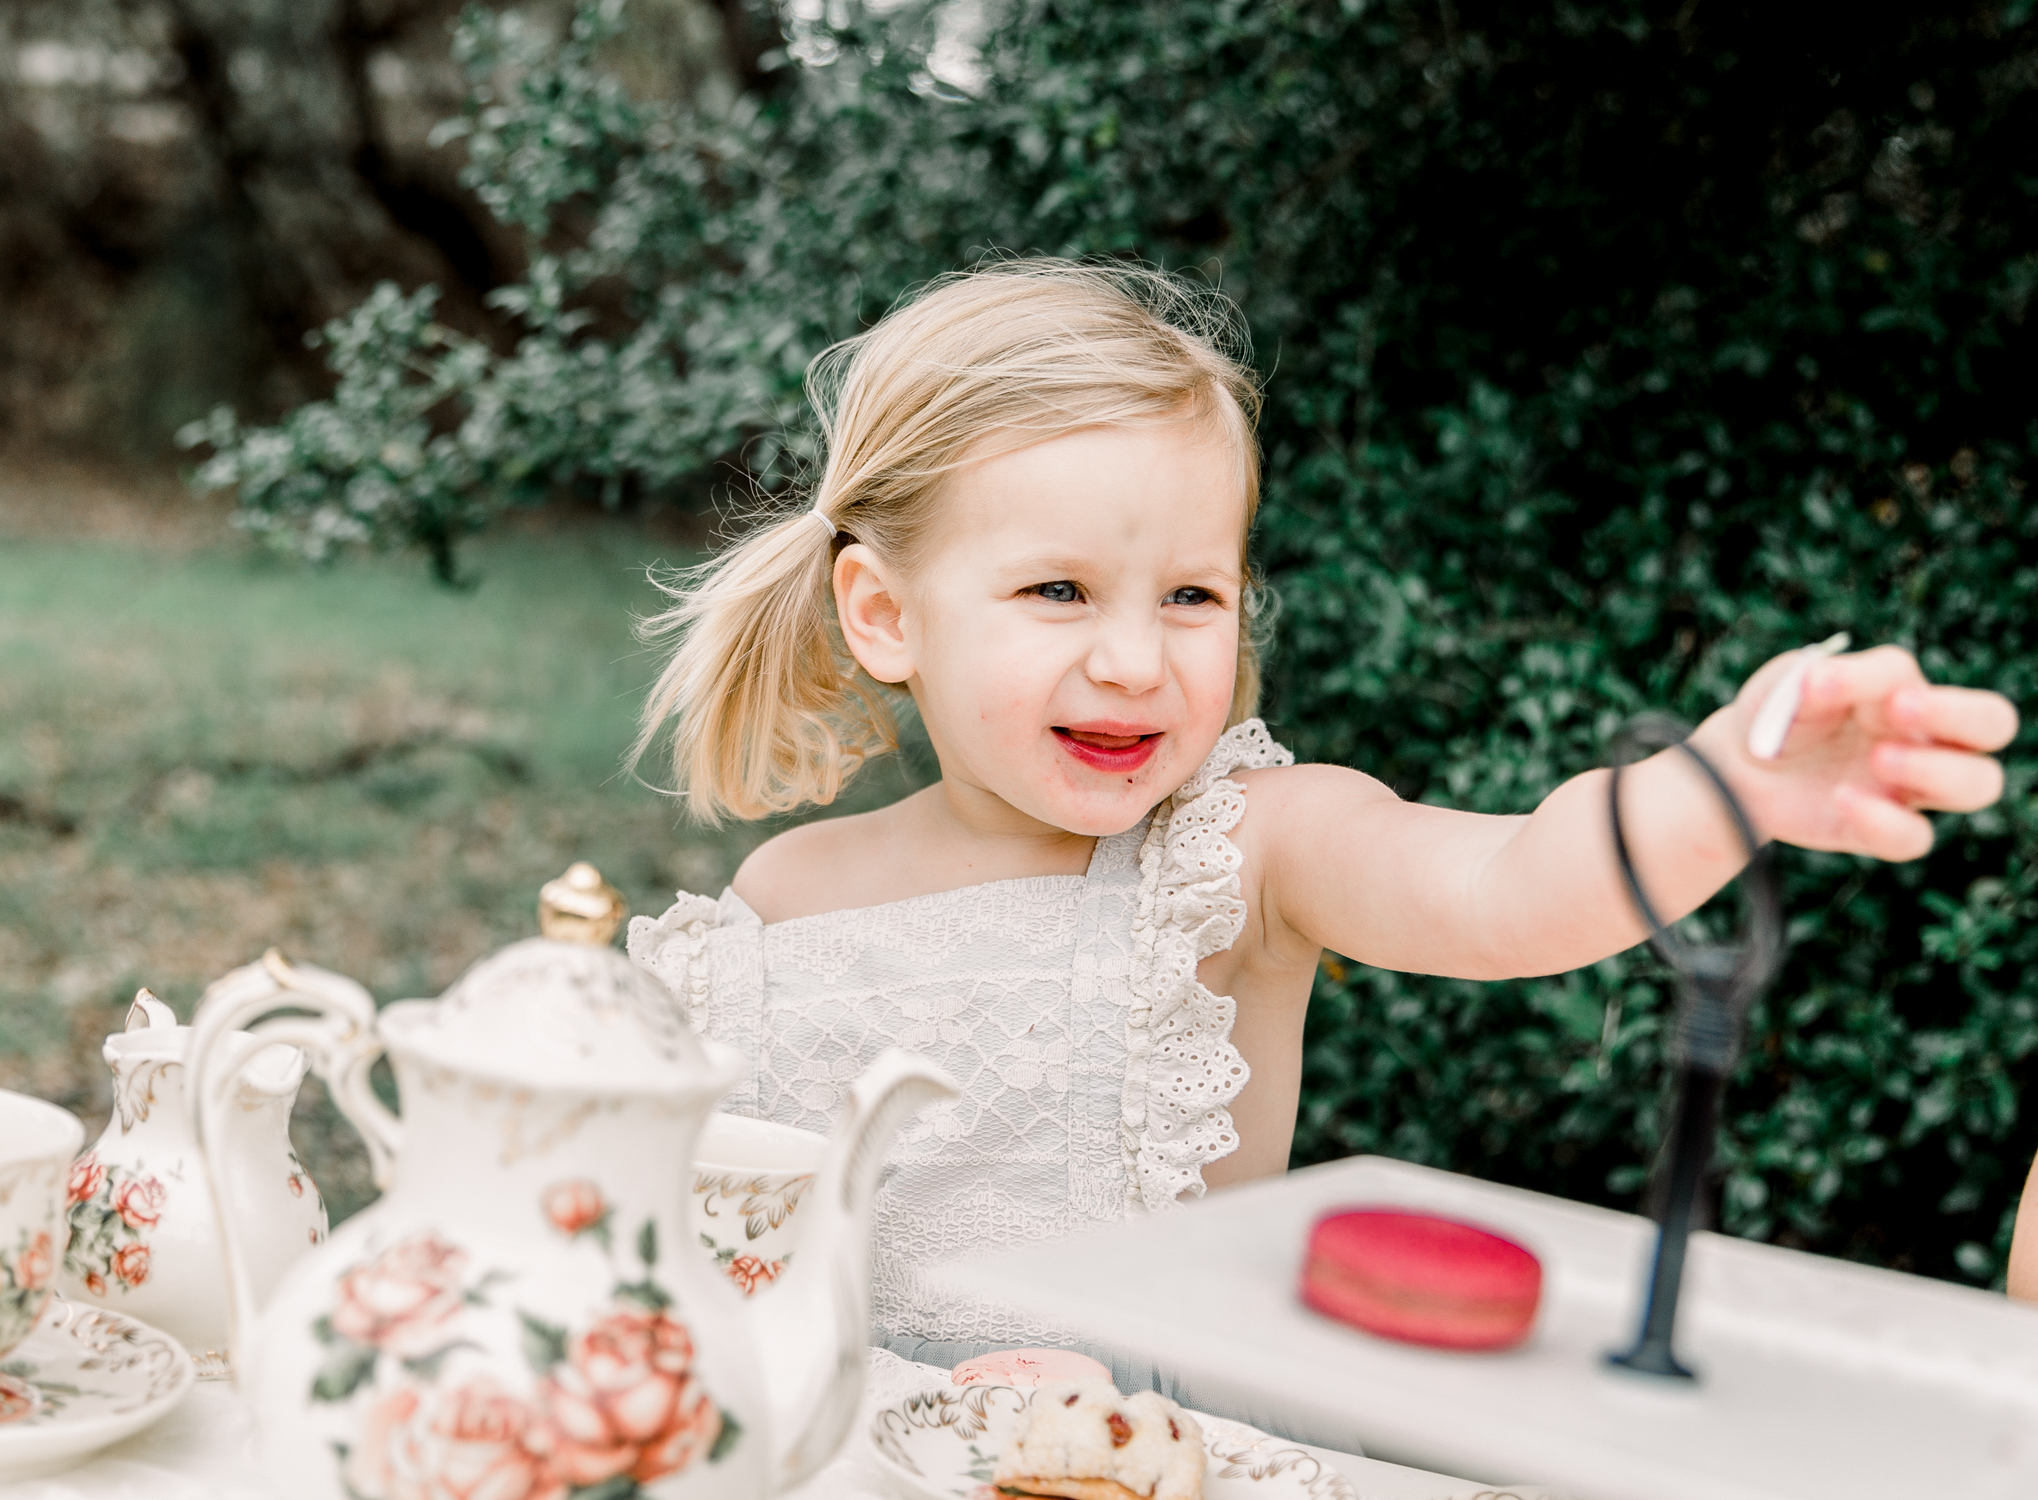 lifestyle-family-photographer-franklin-tea-time-15.jpg